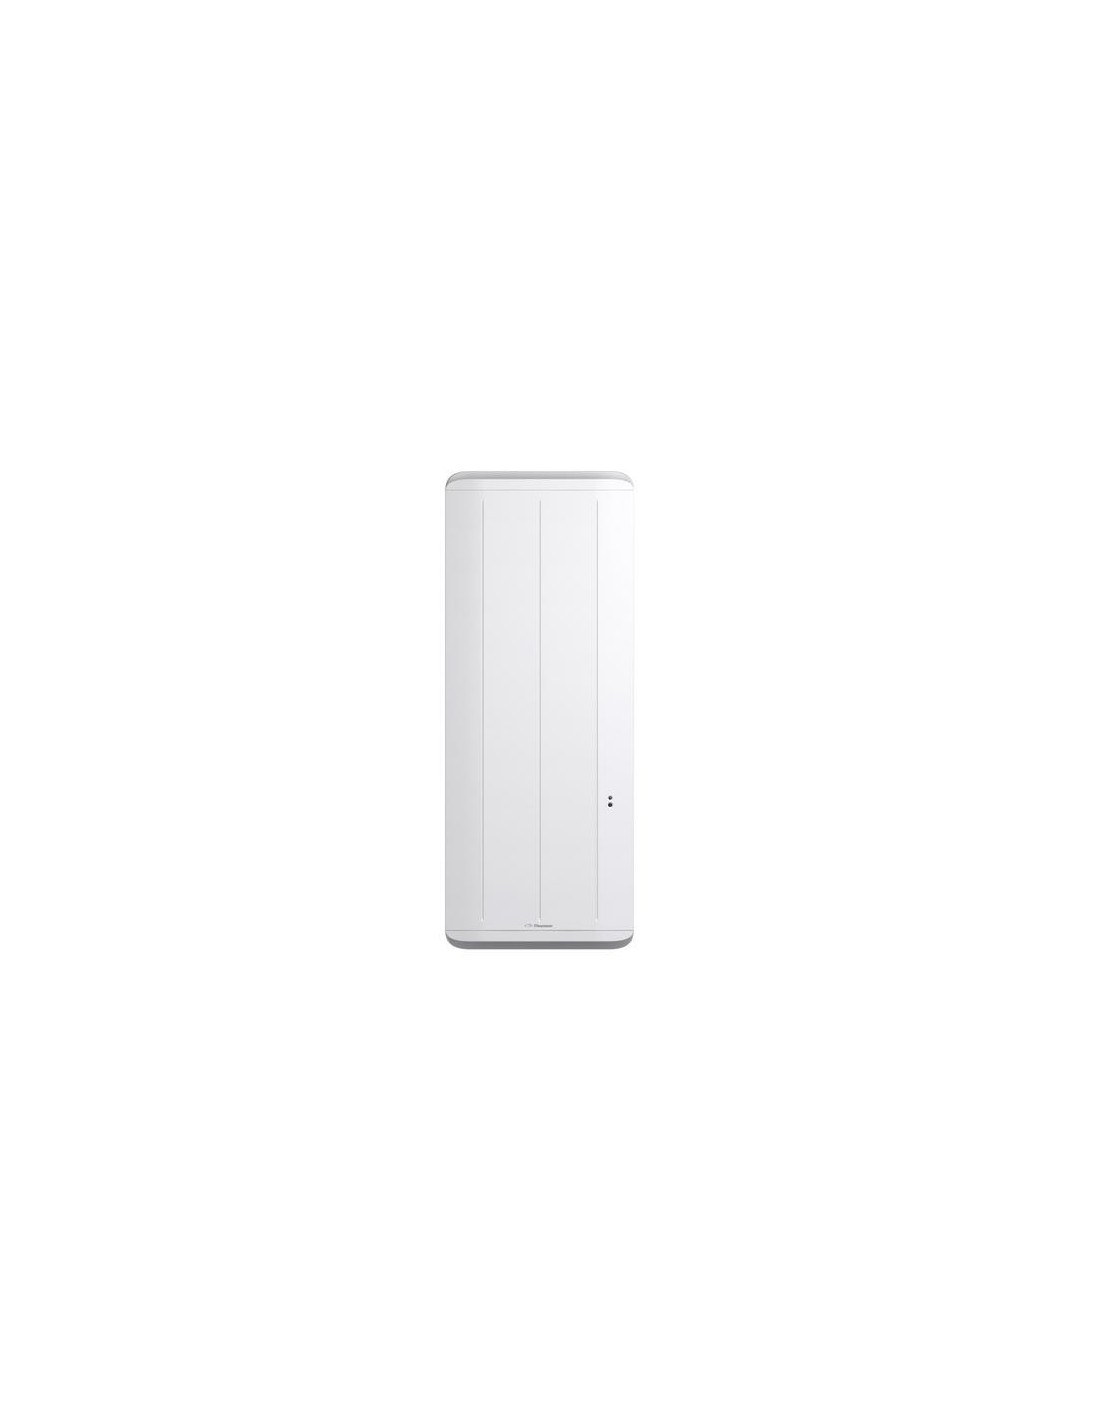 radiateur inertie equateur 2 vertical blanc 1500w. Black Bedroom Furniture Sets. Home Design Ideas